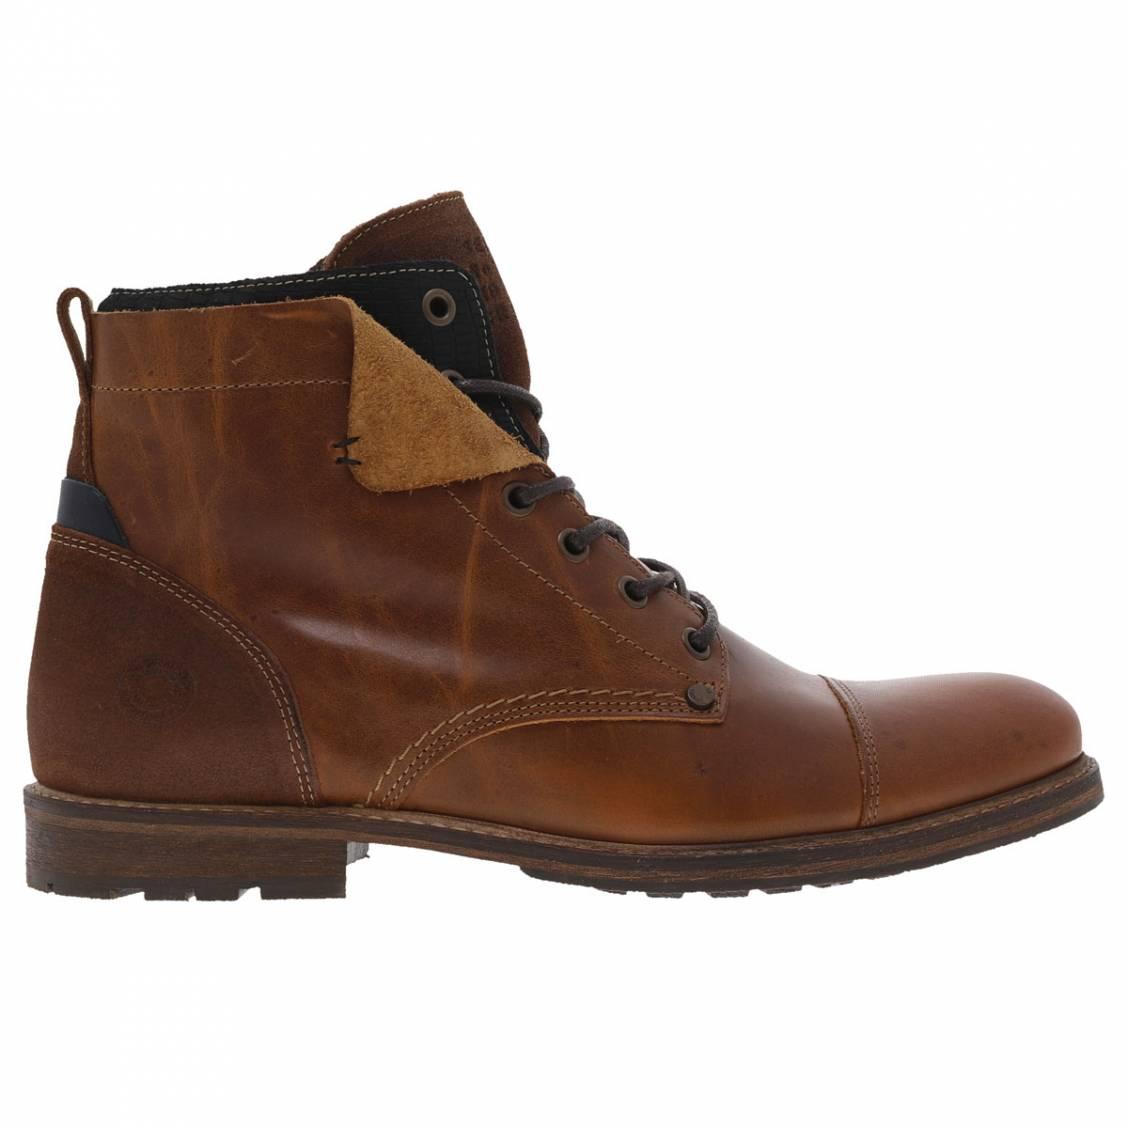 6e237ad1180 Boots hautes Bullboxer marron ...